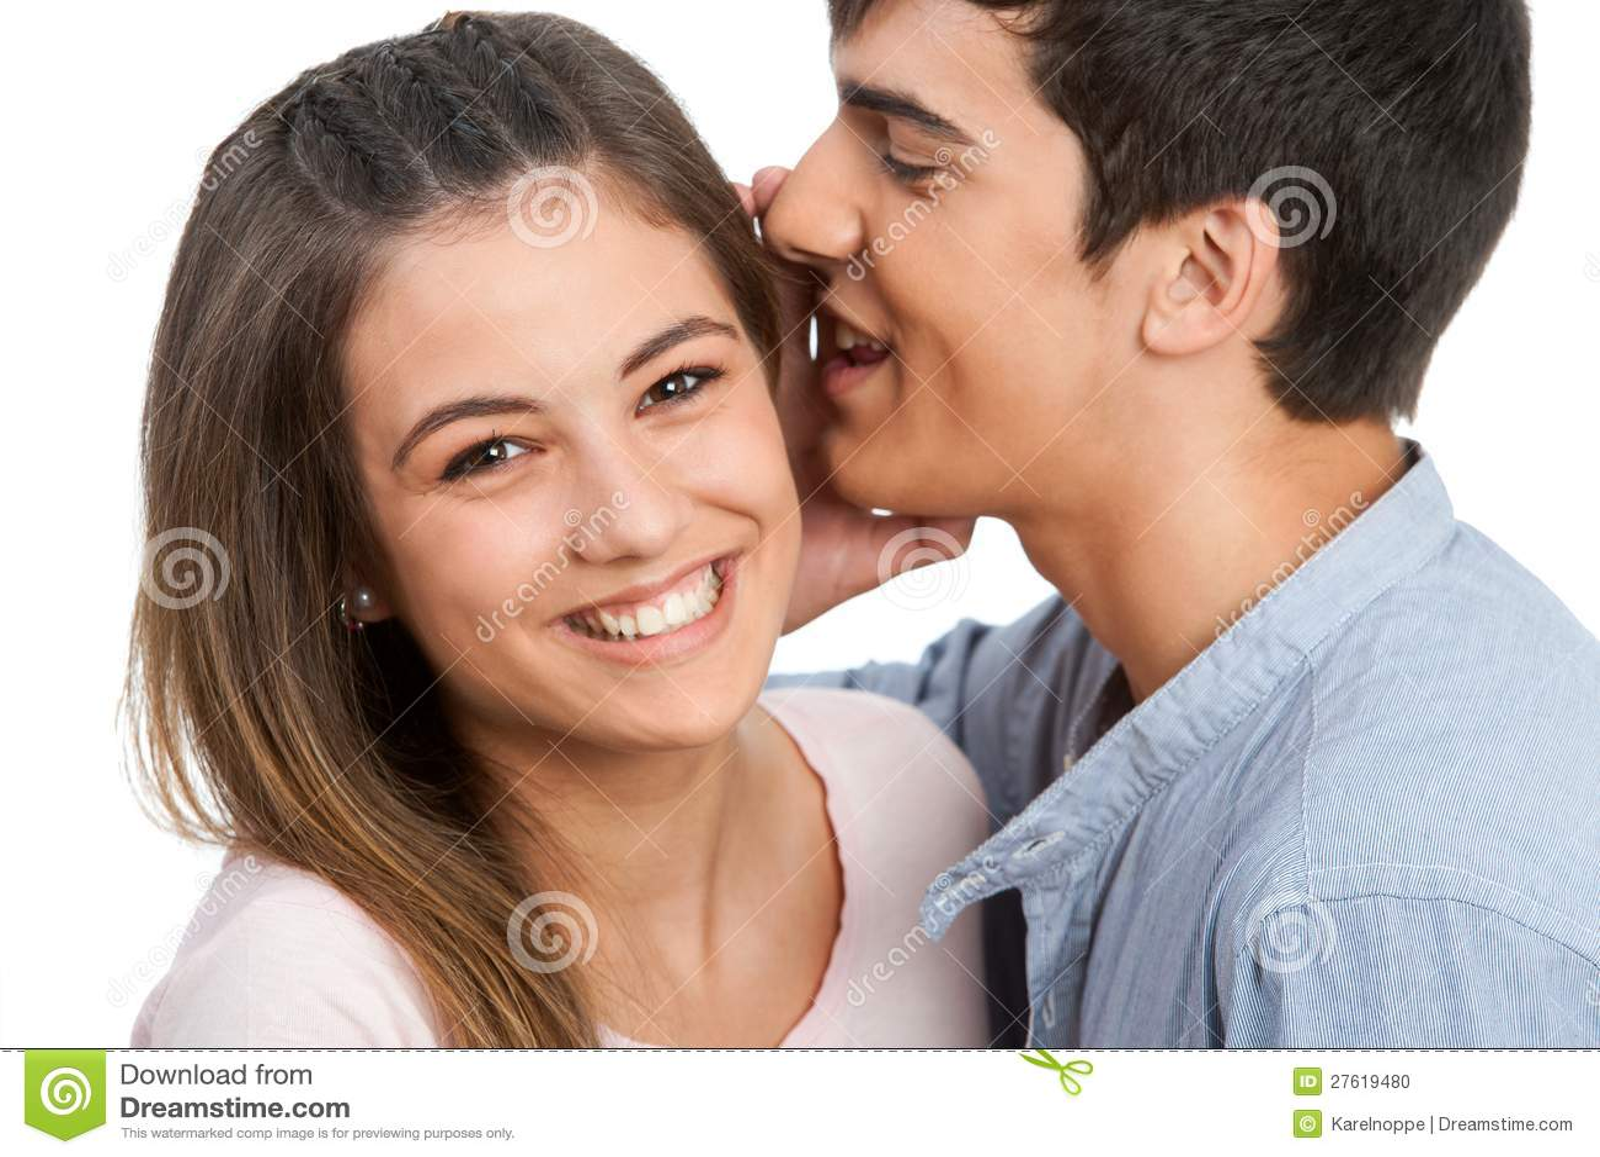 Dating als Freundin des Freundes Westgeschwindigkeit datiert avis